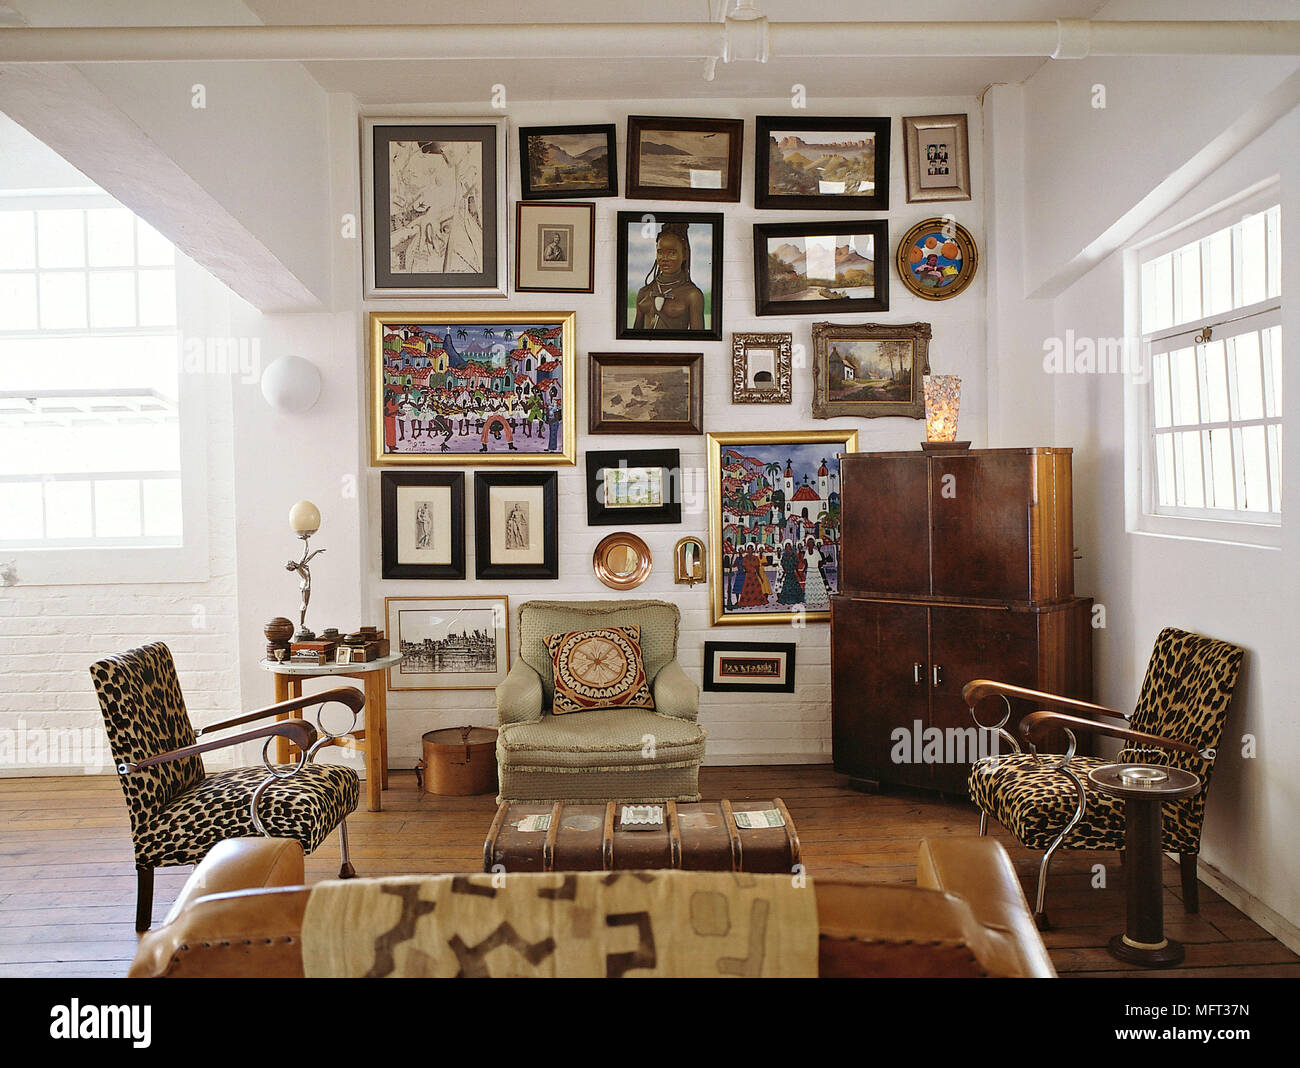 https www alamyimages fr salon moderne fauteuils capitonnes en cuir canape tissu imprime animal cabinet interieurs chambres influence africaine styles ethniques image181852937 html